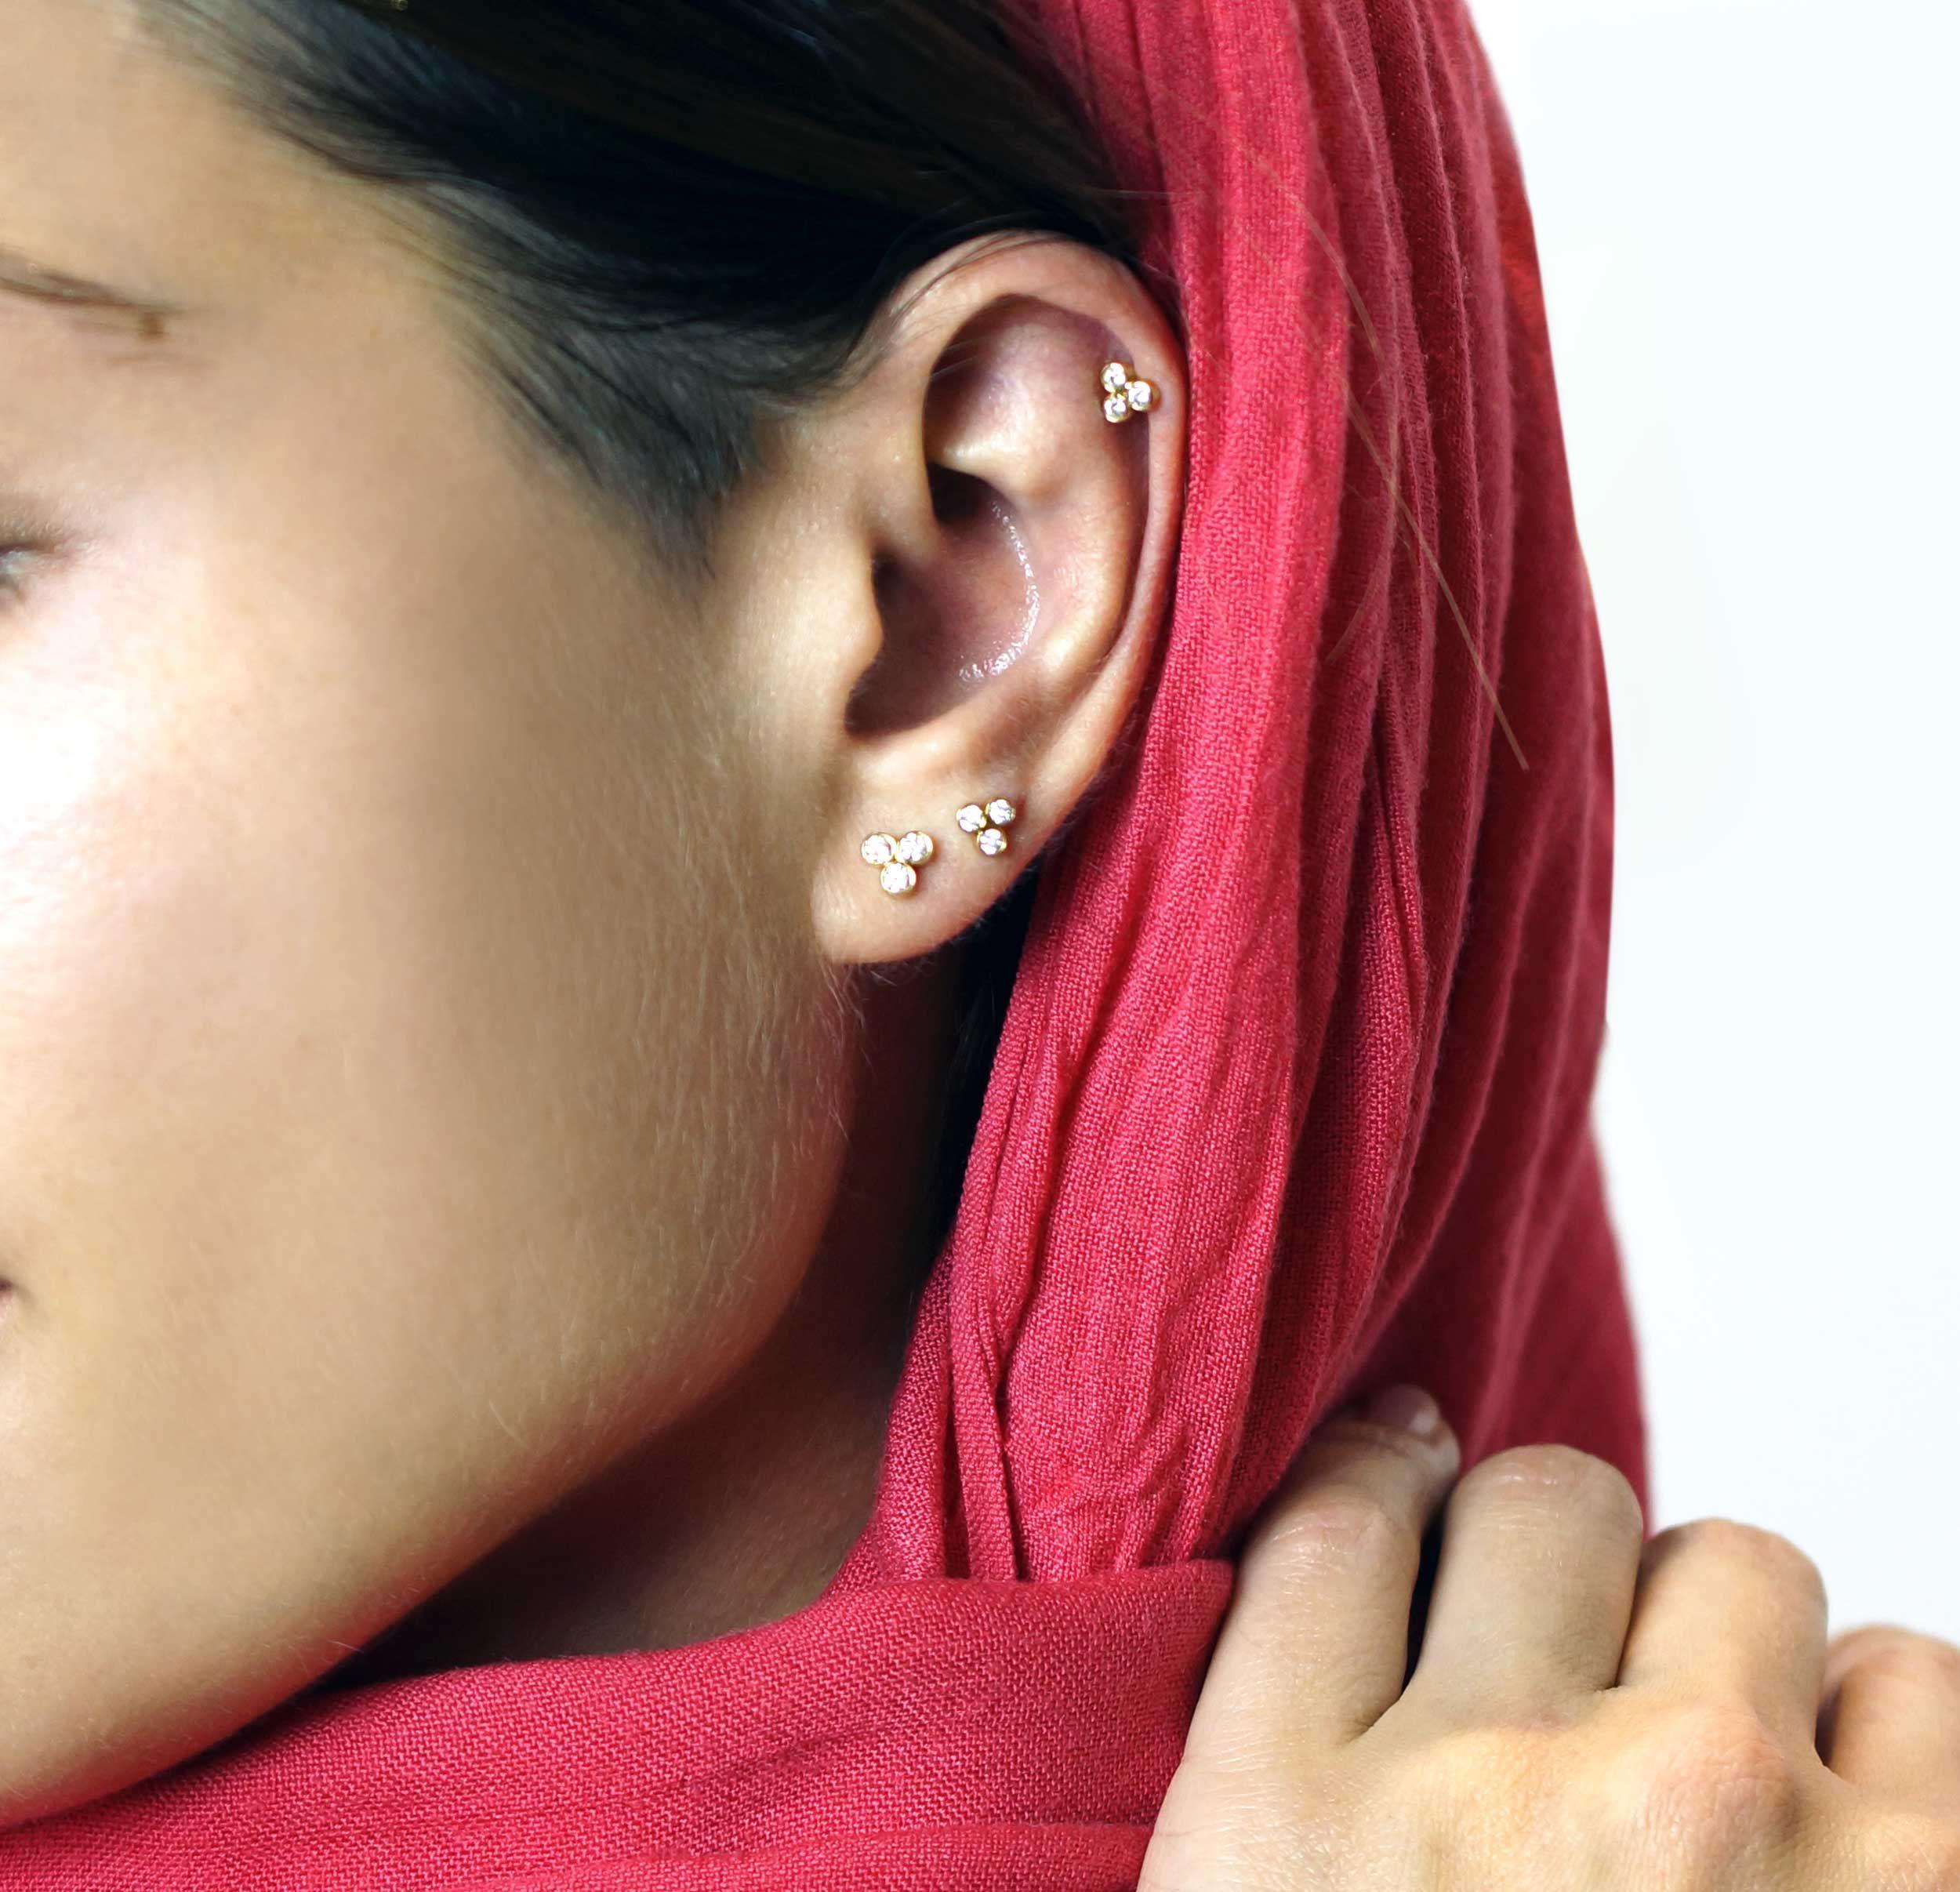 c9cae870f Triple Diamond Triangle 18K Yellow Gold Cartilage Piercing Stud Medium  Sizes | LENA COHEN